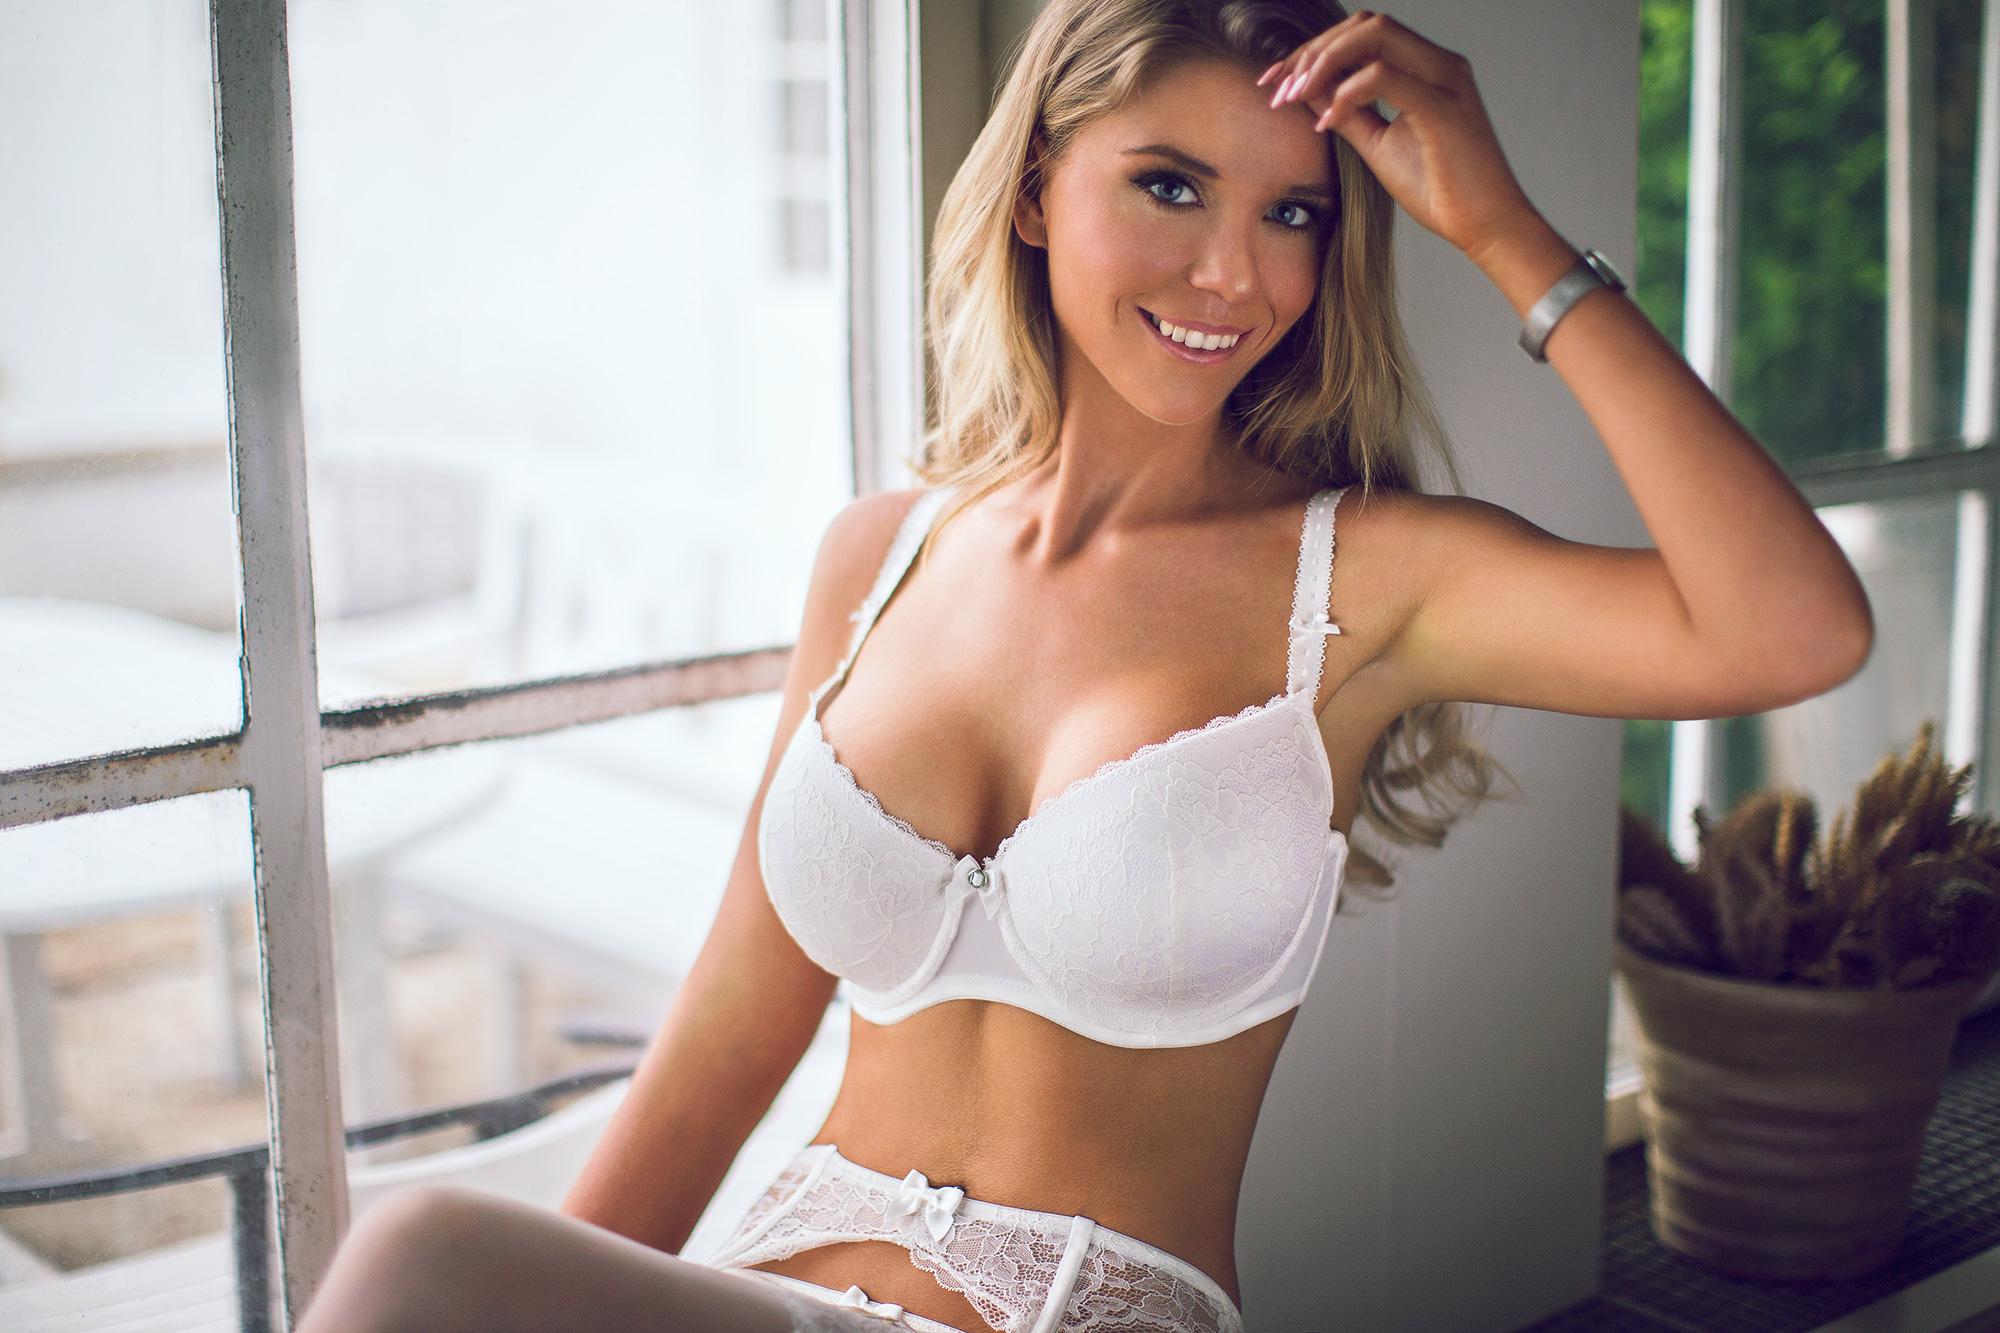 Girls blonde girls white bras nude mens